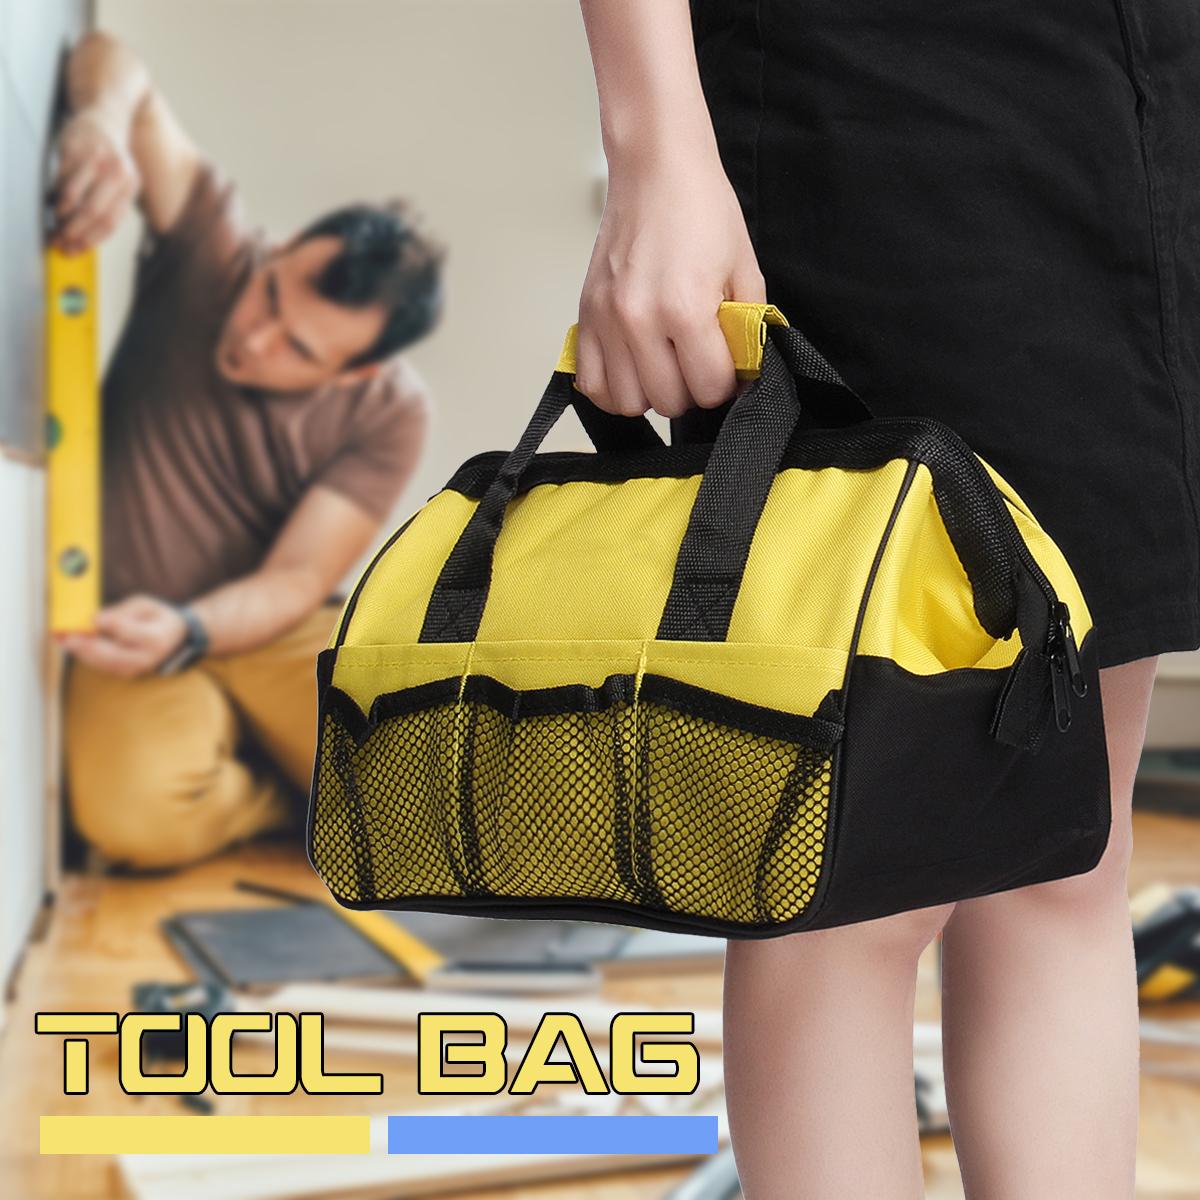 12 Inch 31x18x22cm Portable Electrician Canvas Tool Bag Nylon Canvas Heavy Duty Tool Bag Contractor Storage Hardware Case